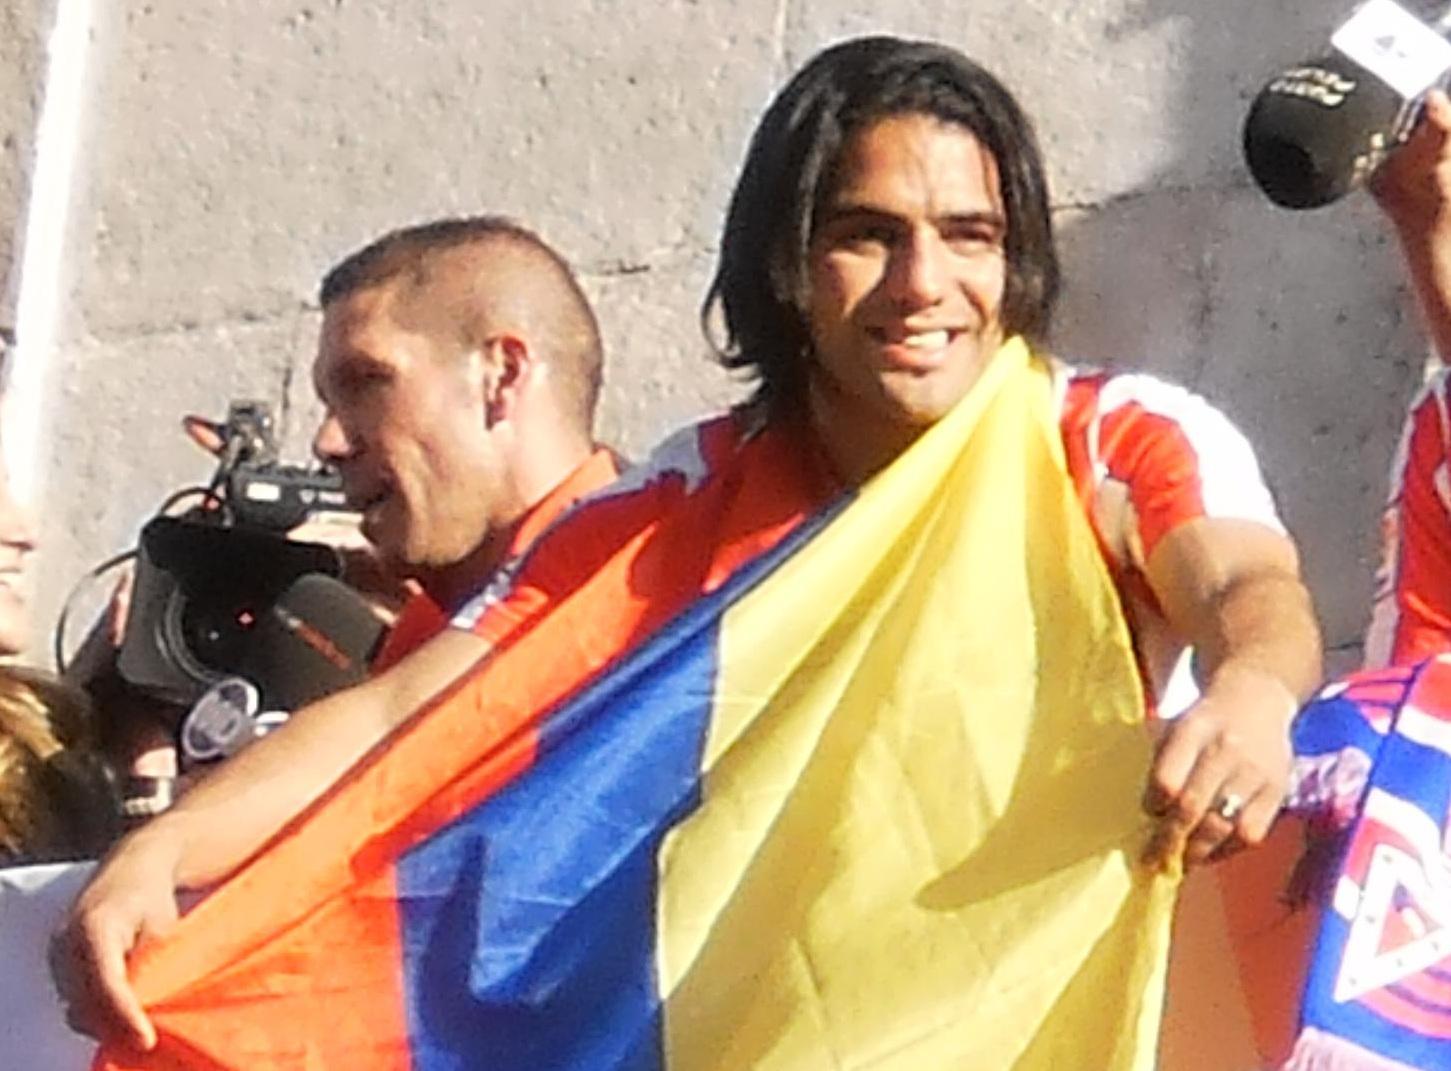 Cette fois, Radamel Falcao ne sera pas de la partie - Photo Juanca Parce - Wikimedia